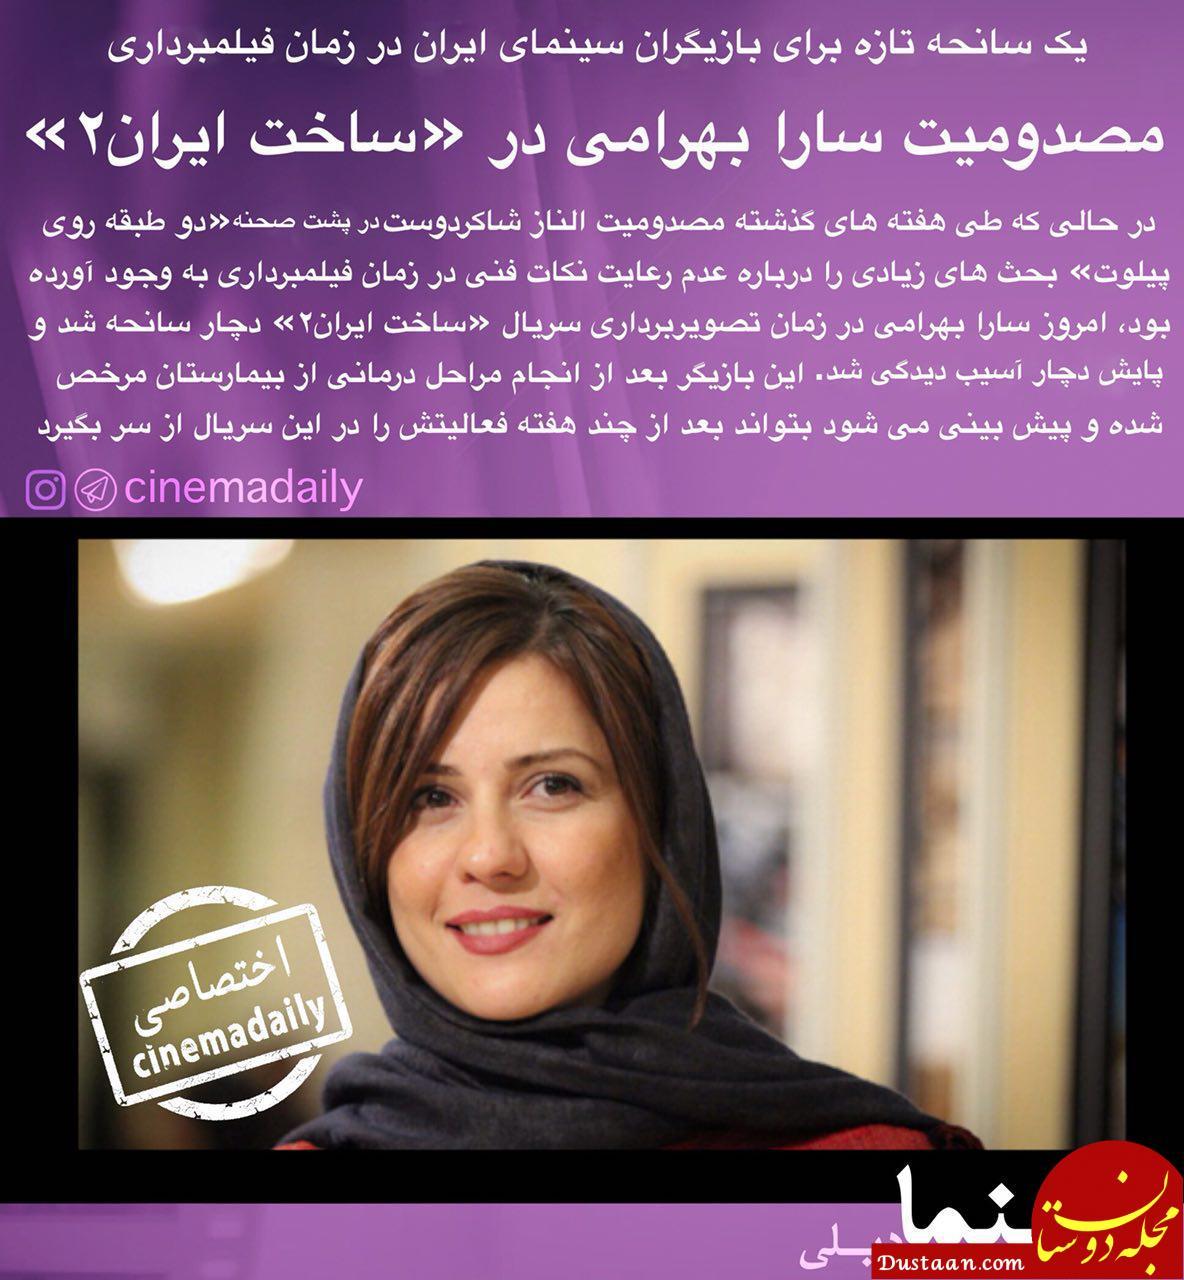 www.dustaan.com جزئیات مصدومیت سارا بهرامی سر صحنه «ساخت ایران۲» +عکس